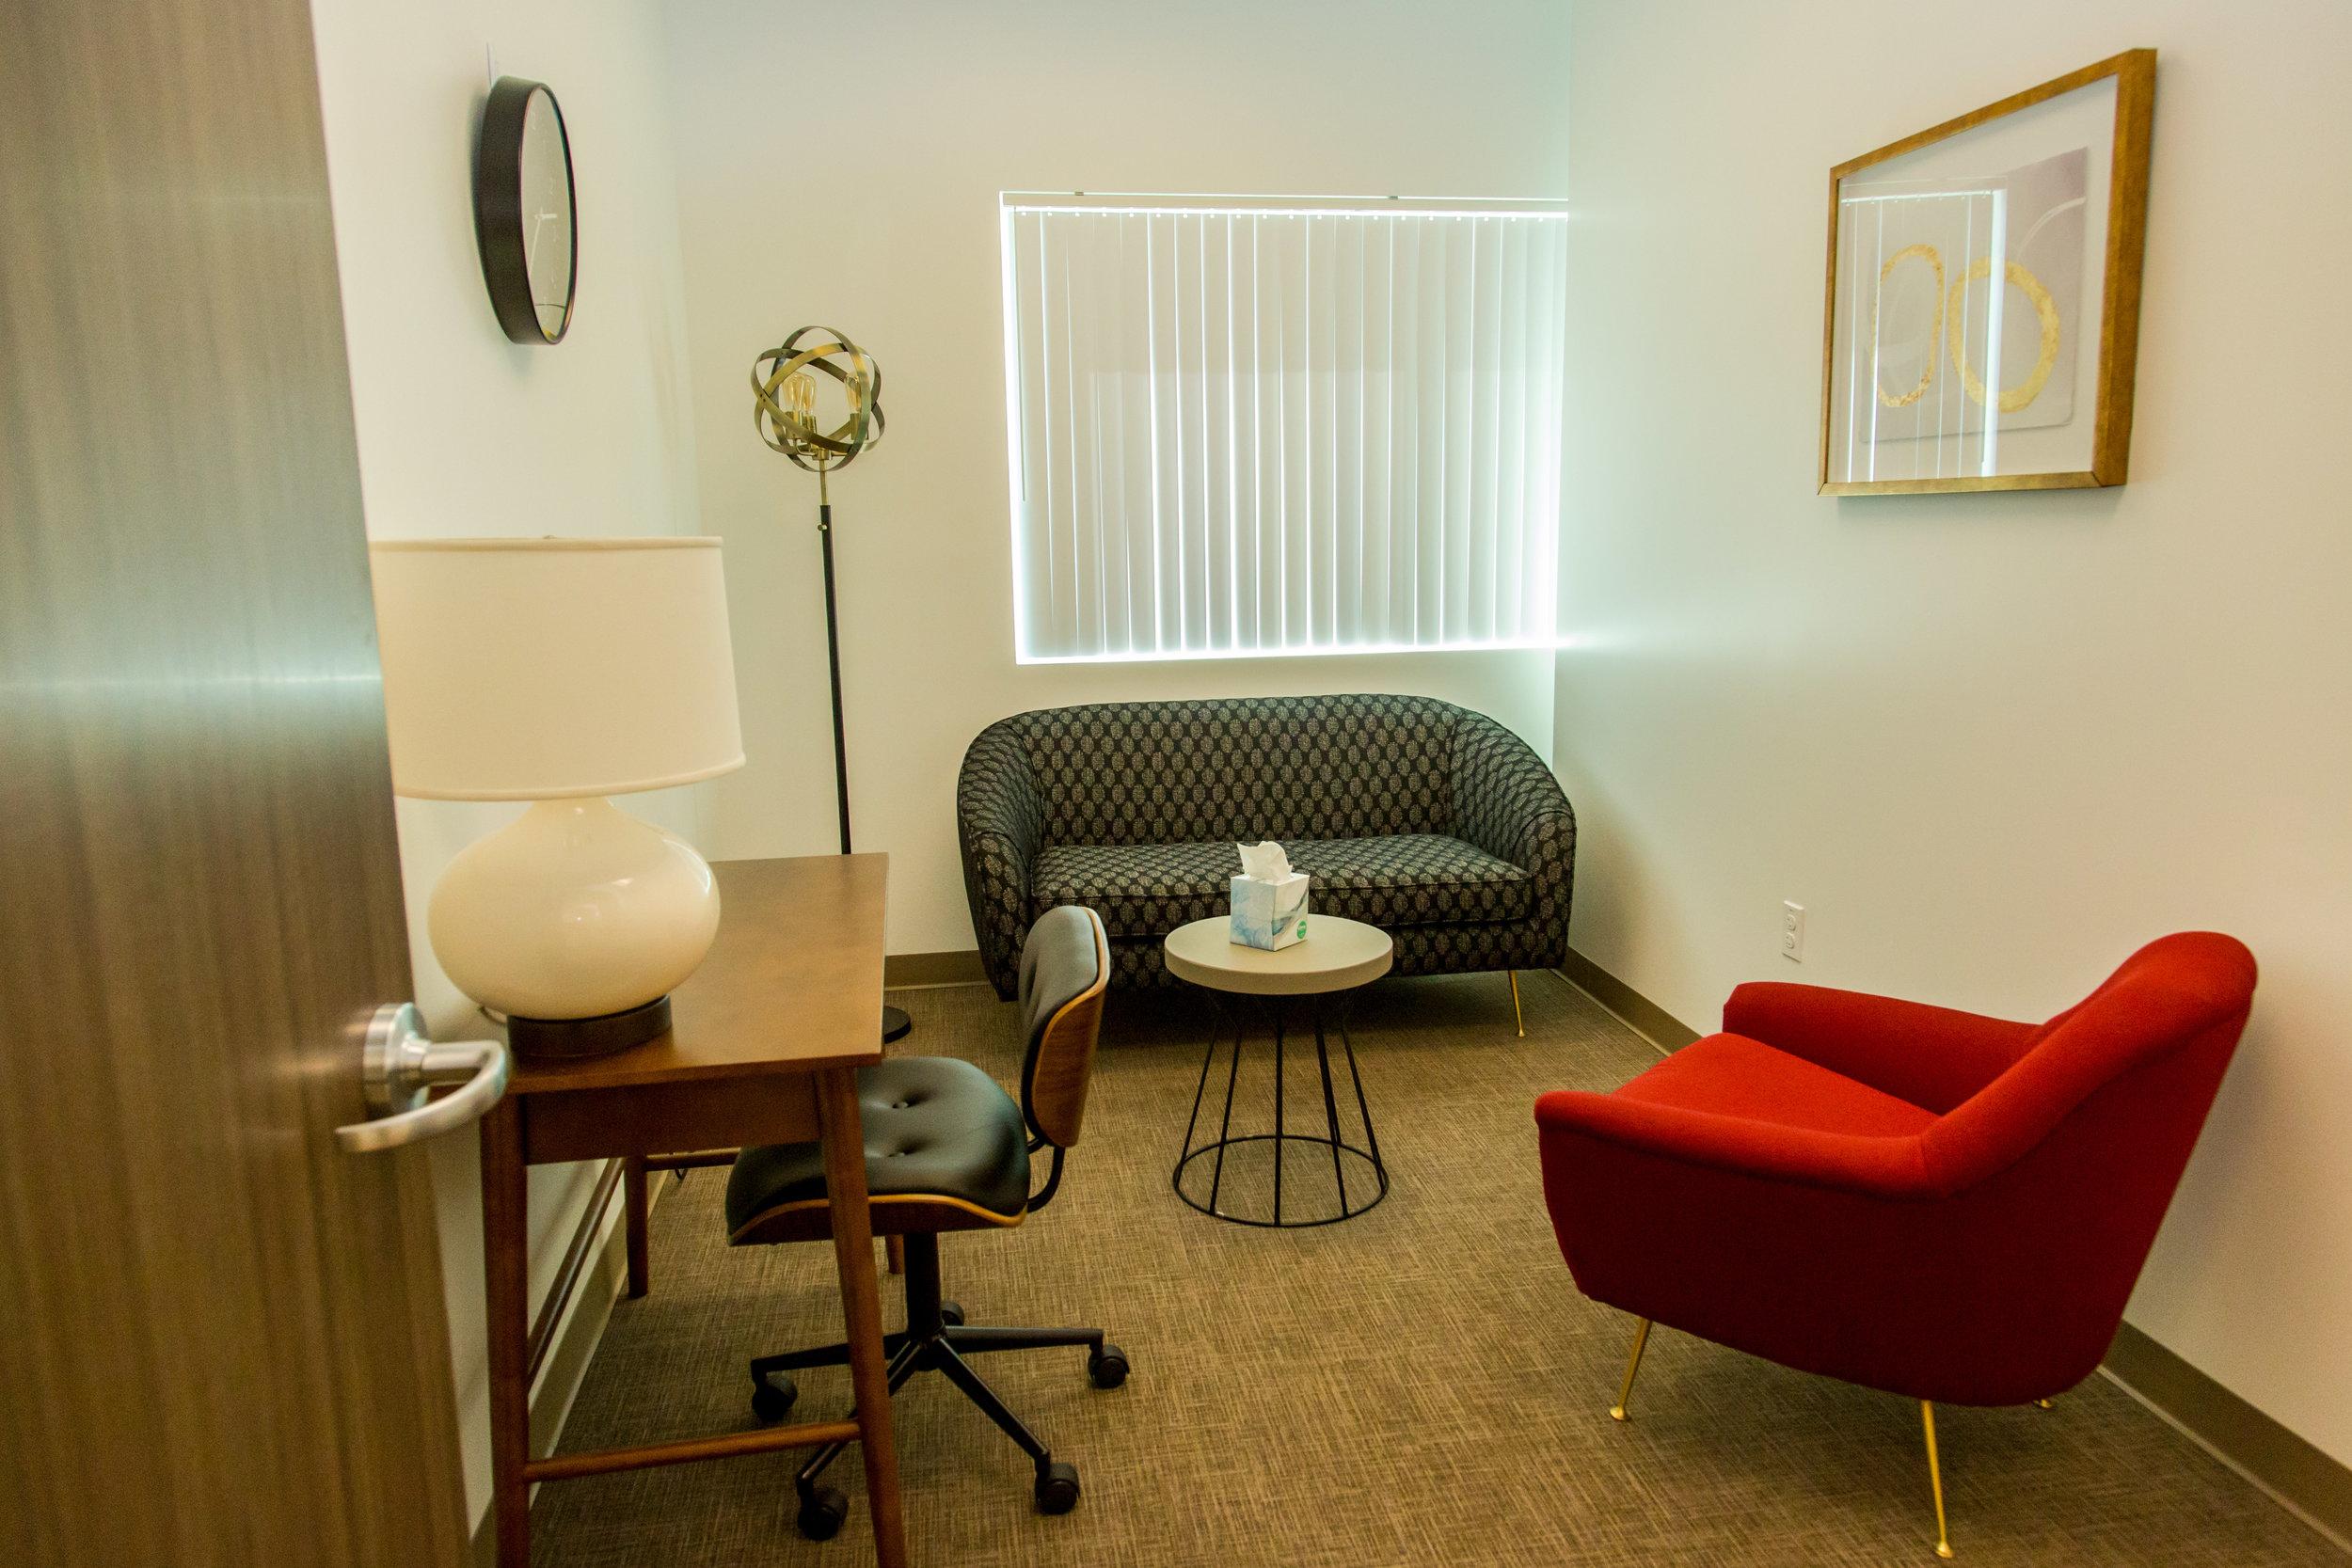 Sadac behavioral health lmft office 1